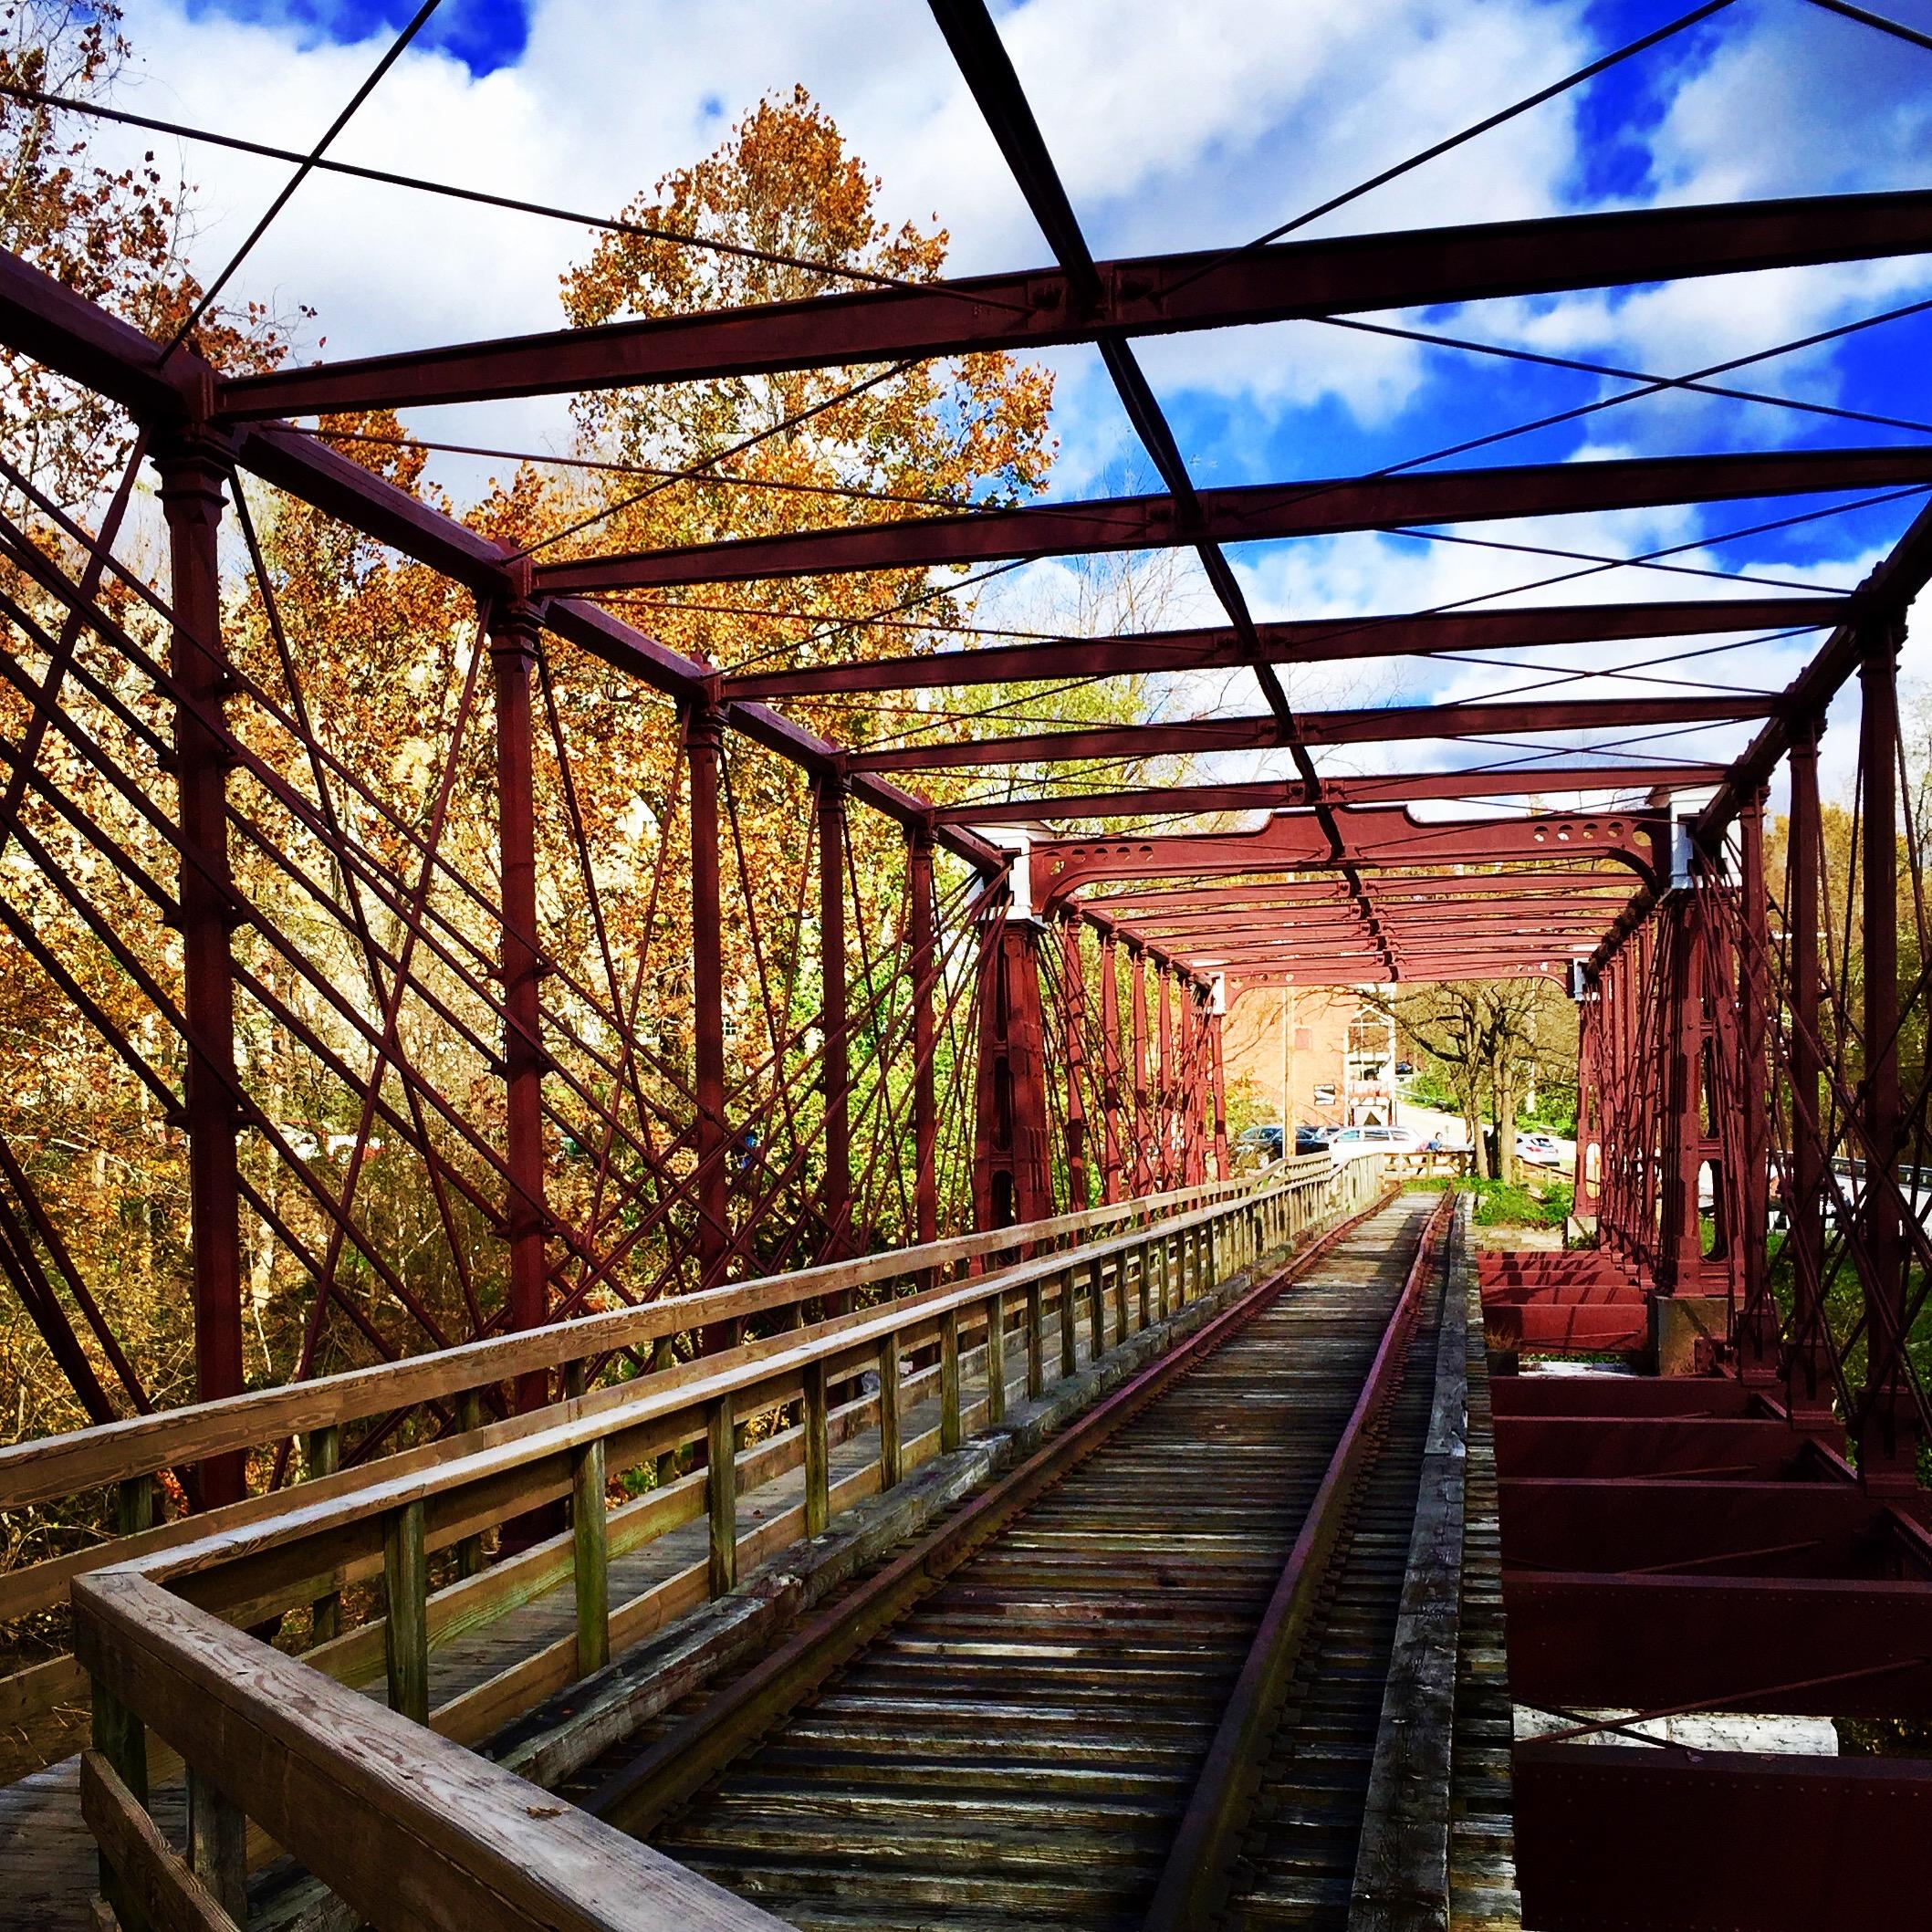 Bollman Truss Railroad Bridge, Christa Emmer